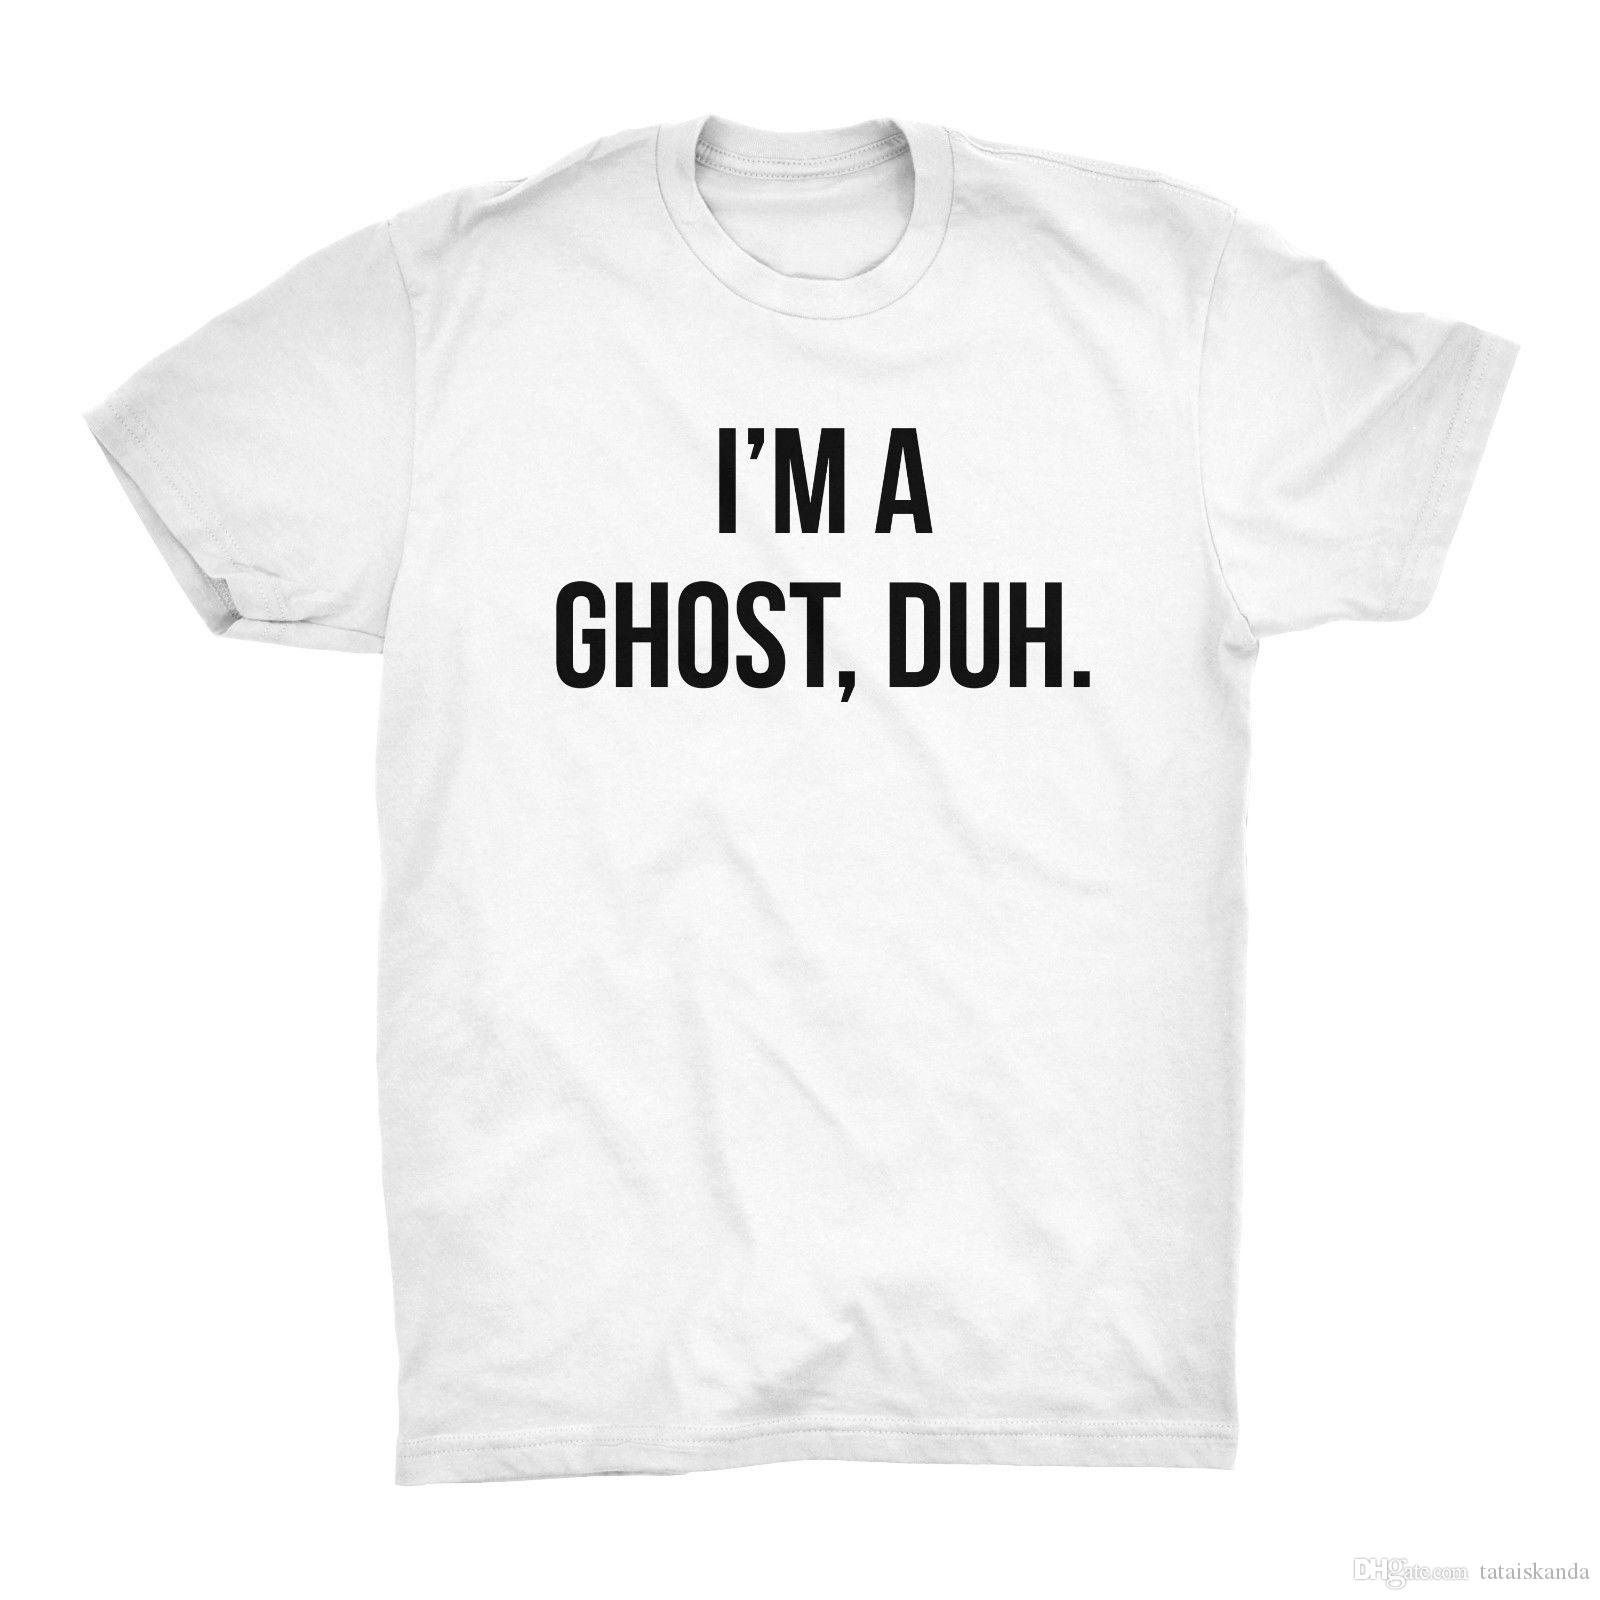 c5ac46a49 Halloween T Shirt Top I'M A Ghost, Duh Lazy Costume Funny Idea Monster  Spooky Designer White T Shirts Designer Tee From Tataiskanda, $10.0|  DHgate.Com